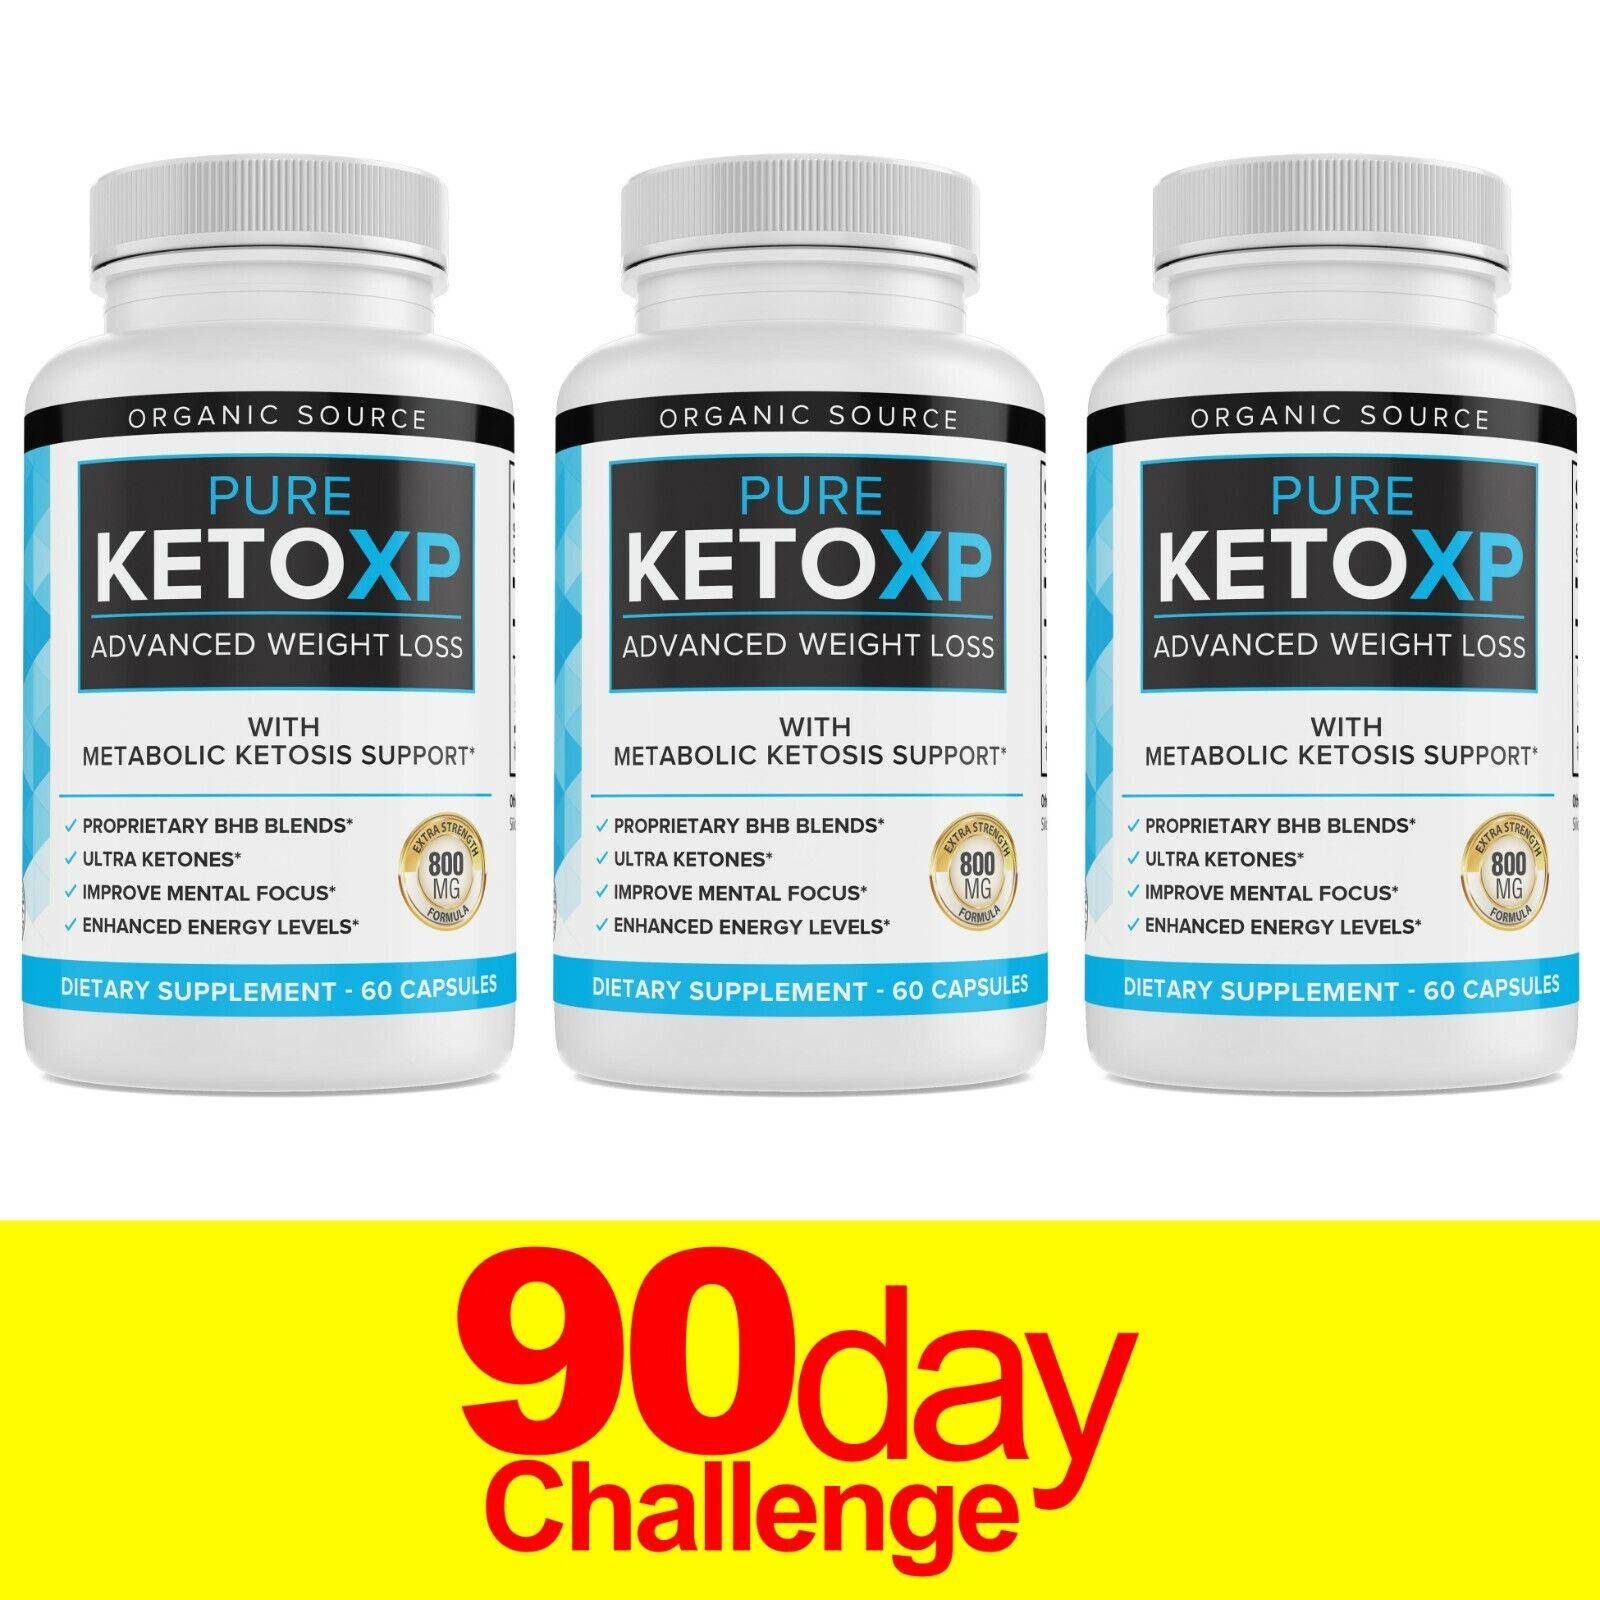 Ketoxp Xp Keto Pills Boost Weight Loss Diet Pills Best Keto XP BHB Supplement